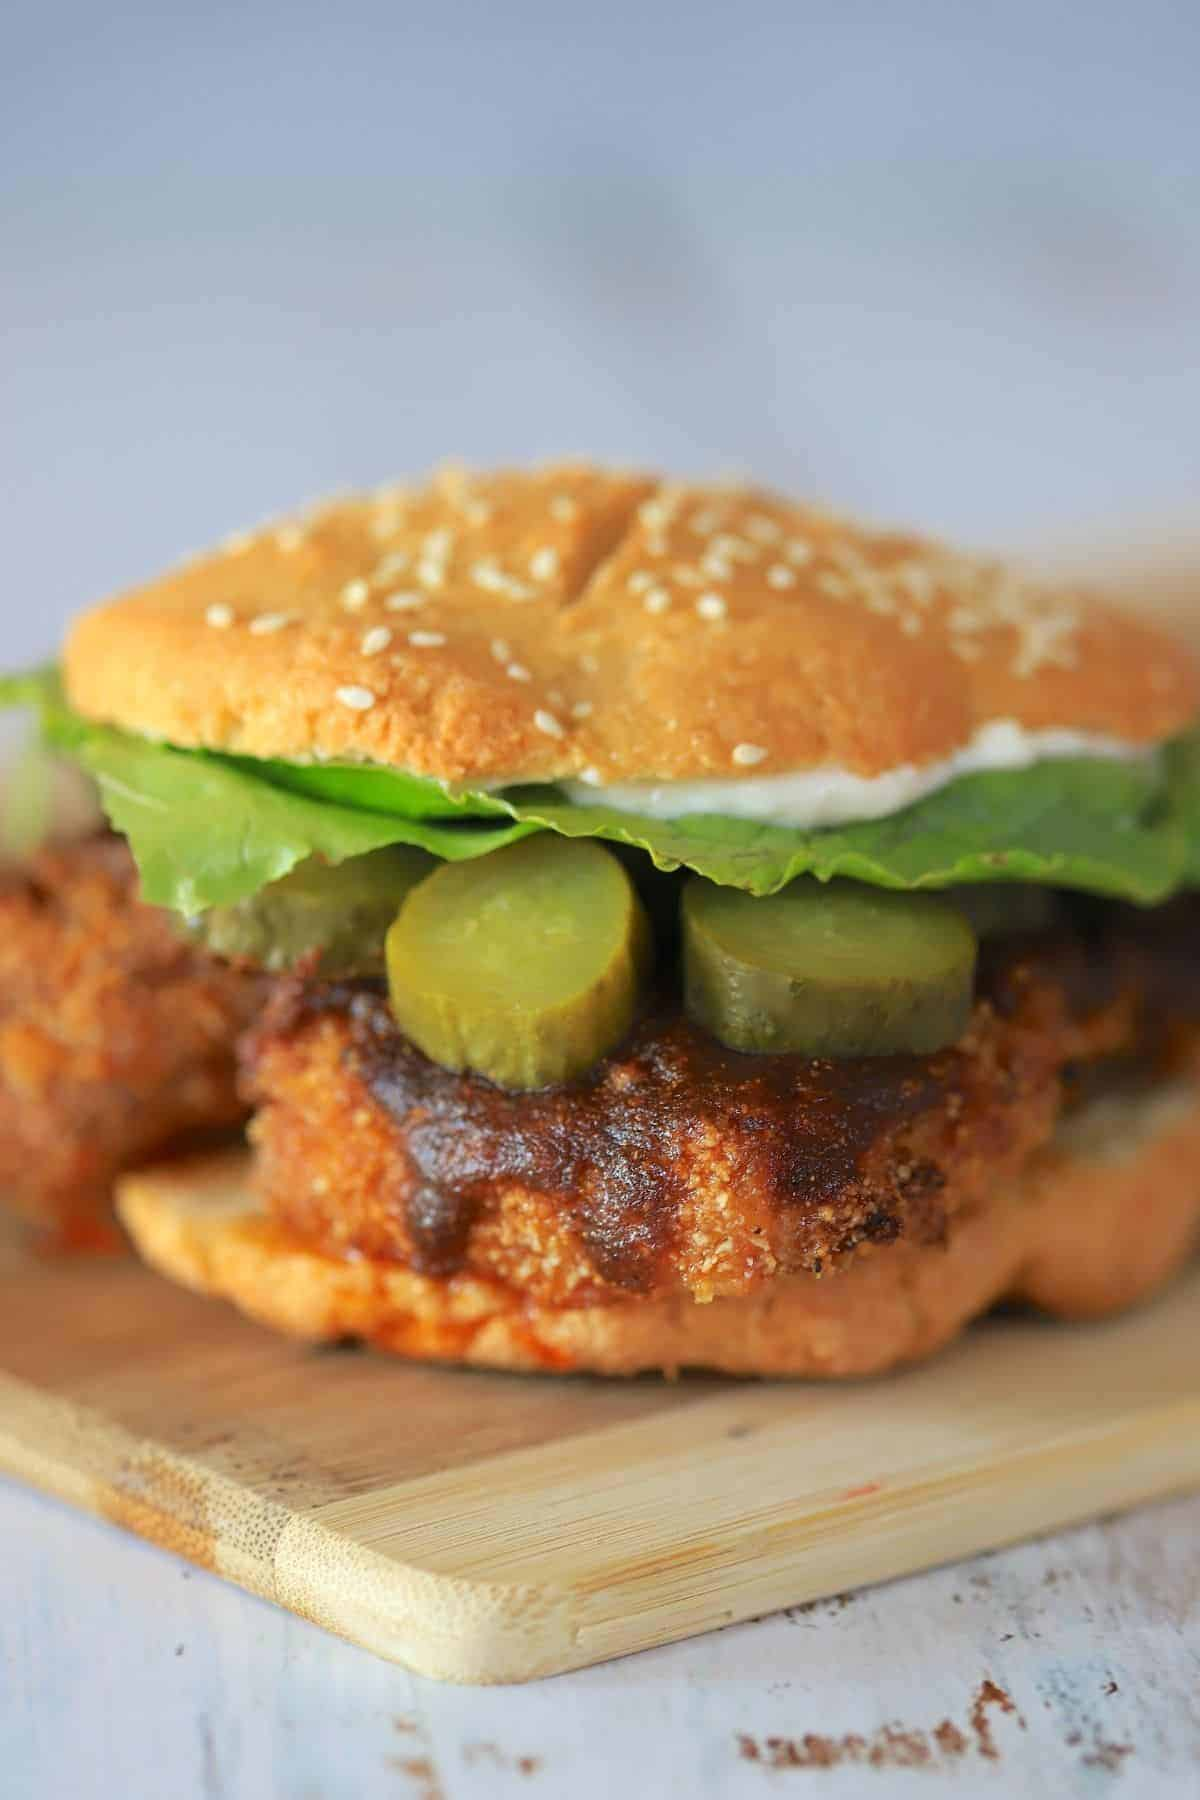 nashville hot chicken sandwich on a cutting board